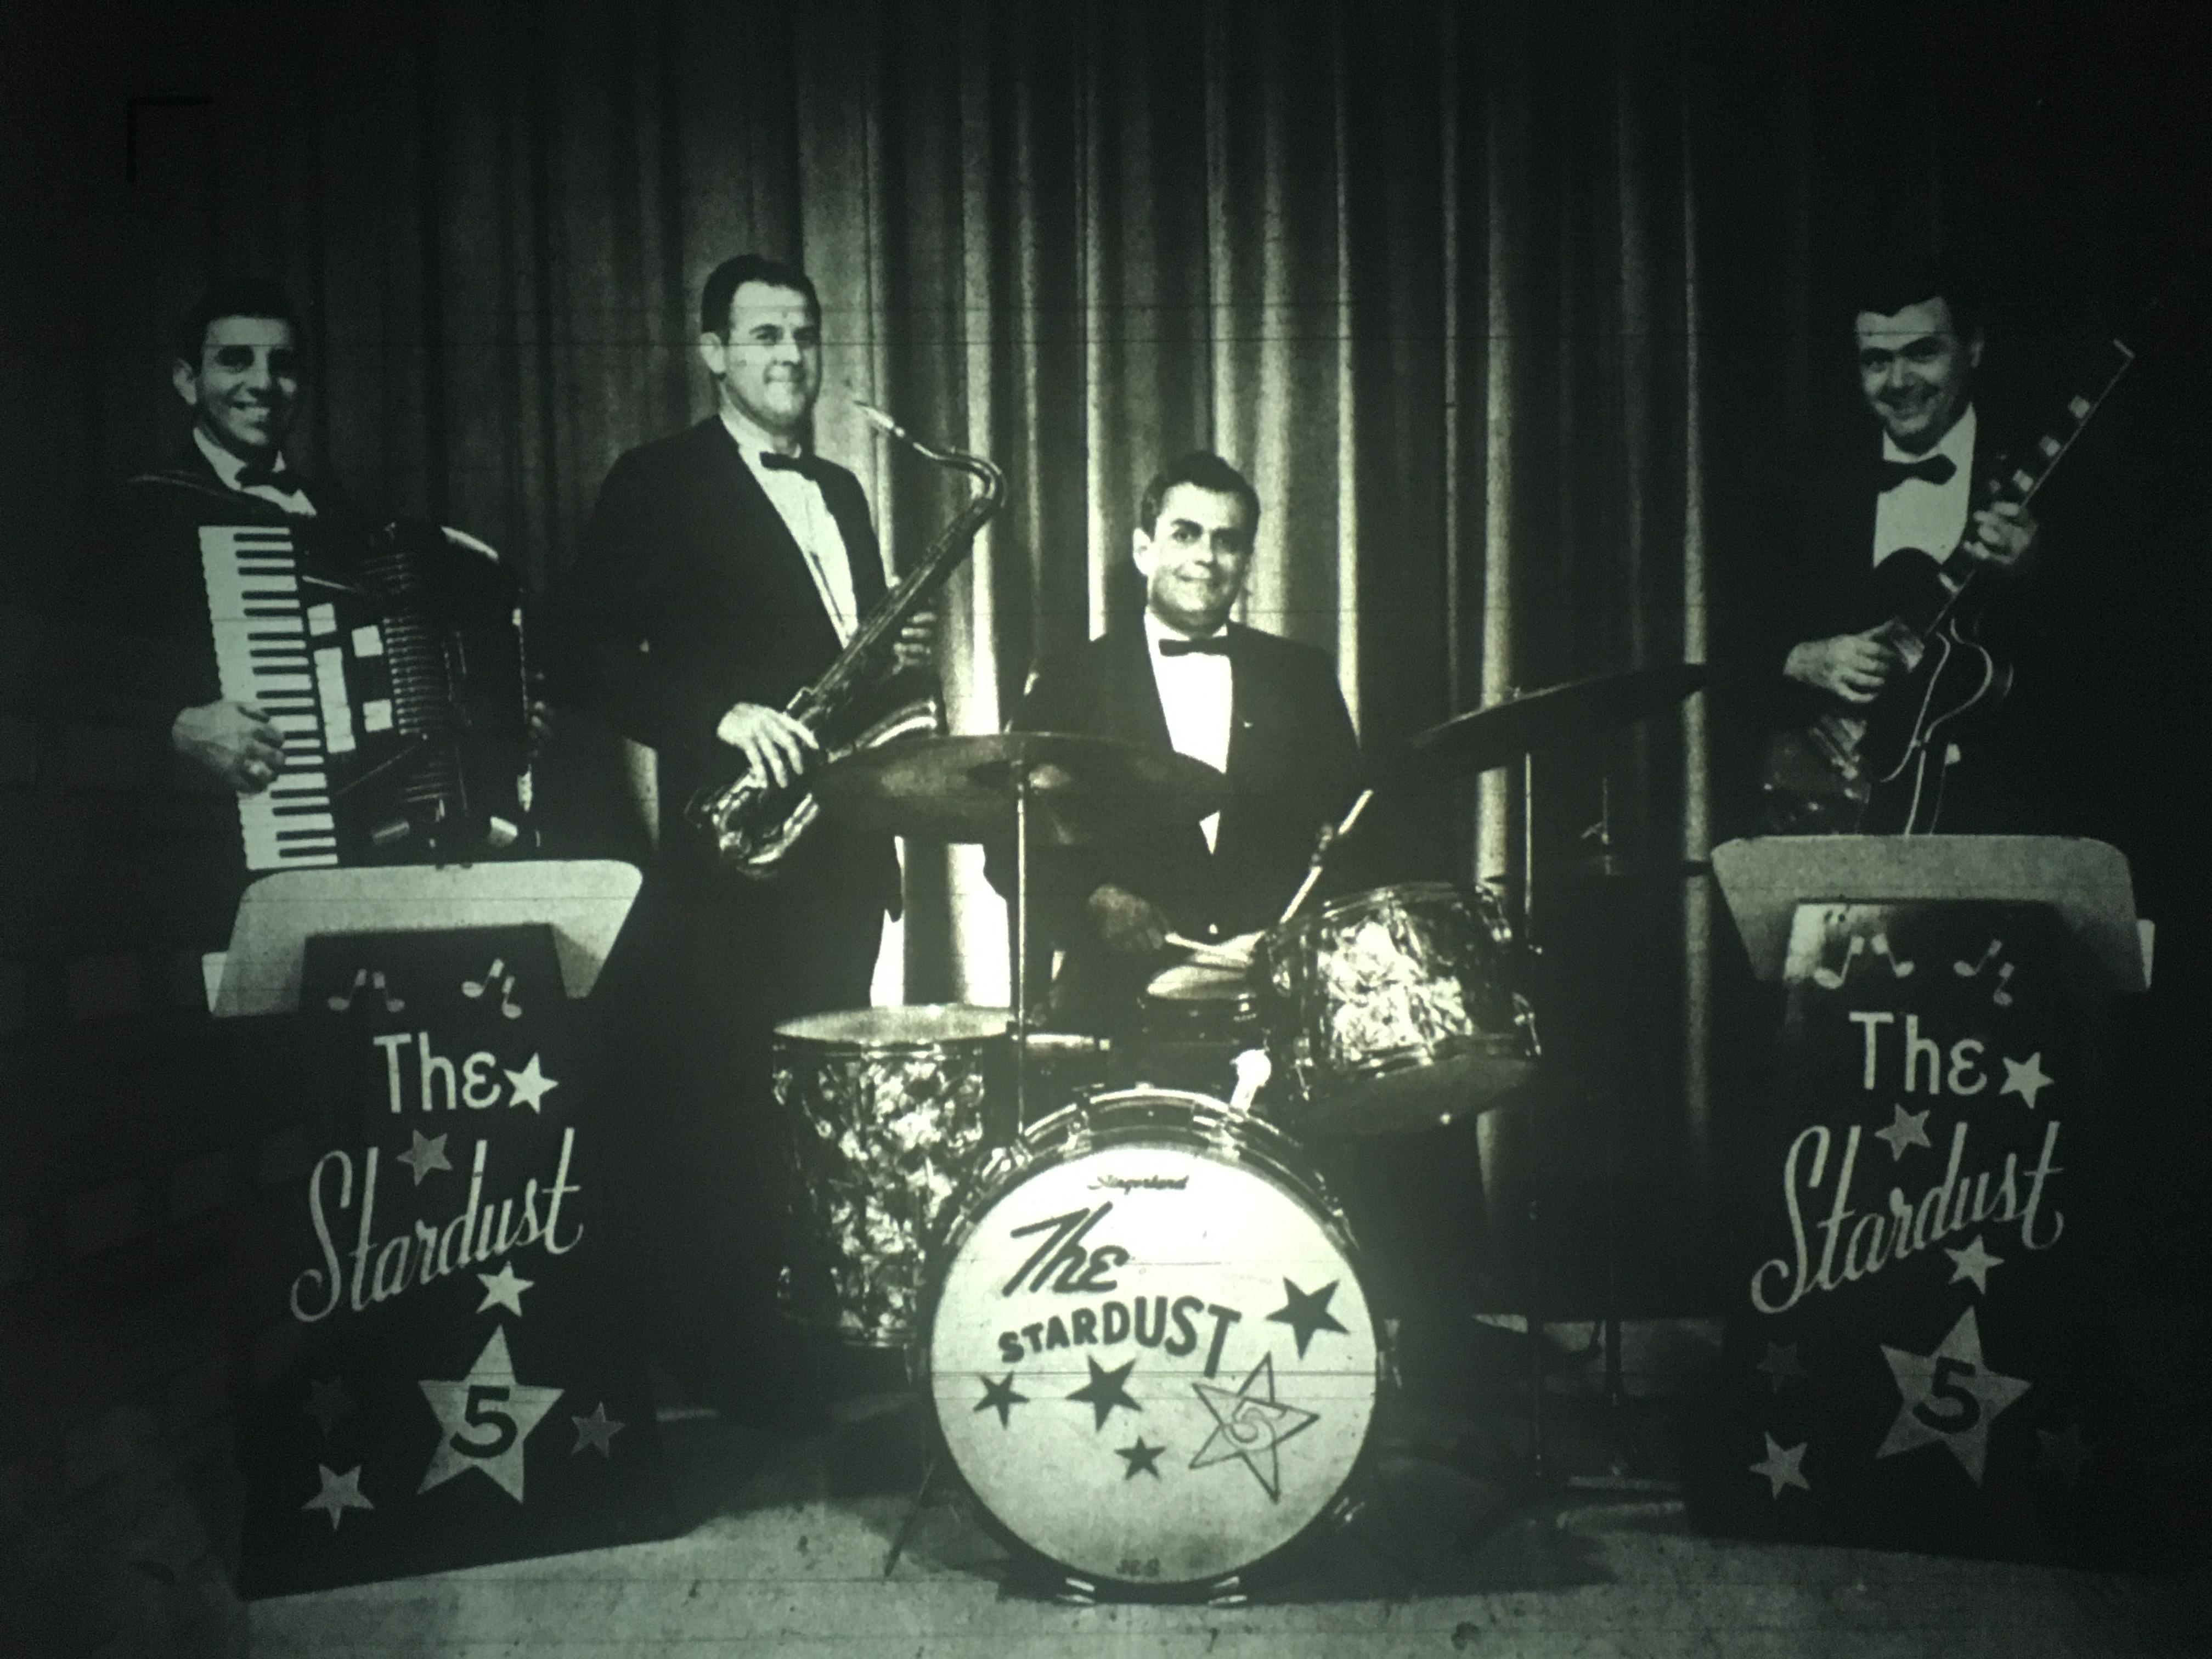 The Stardust, Burlington MA